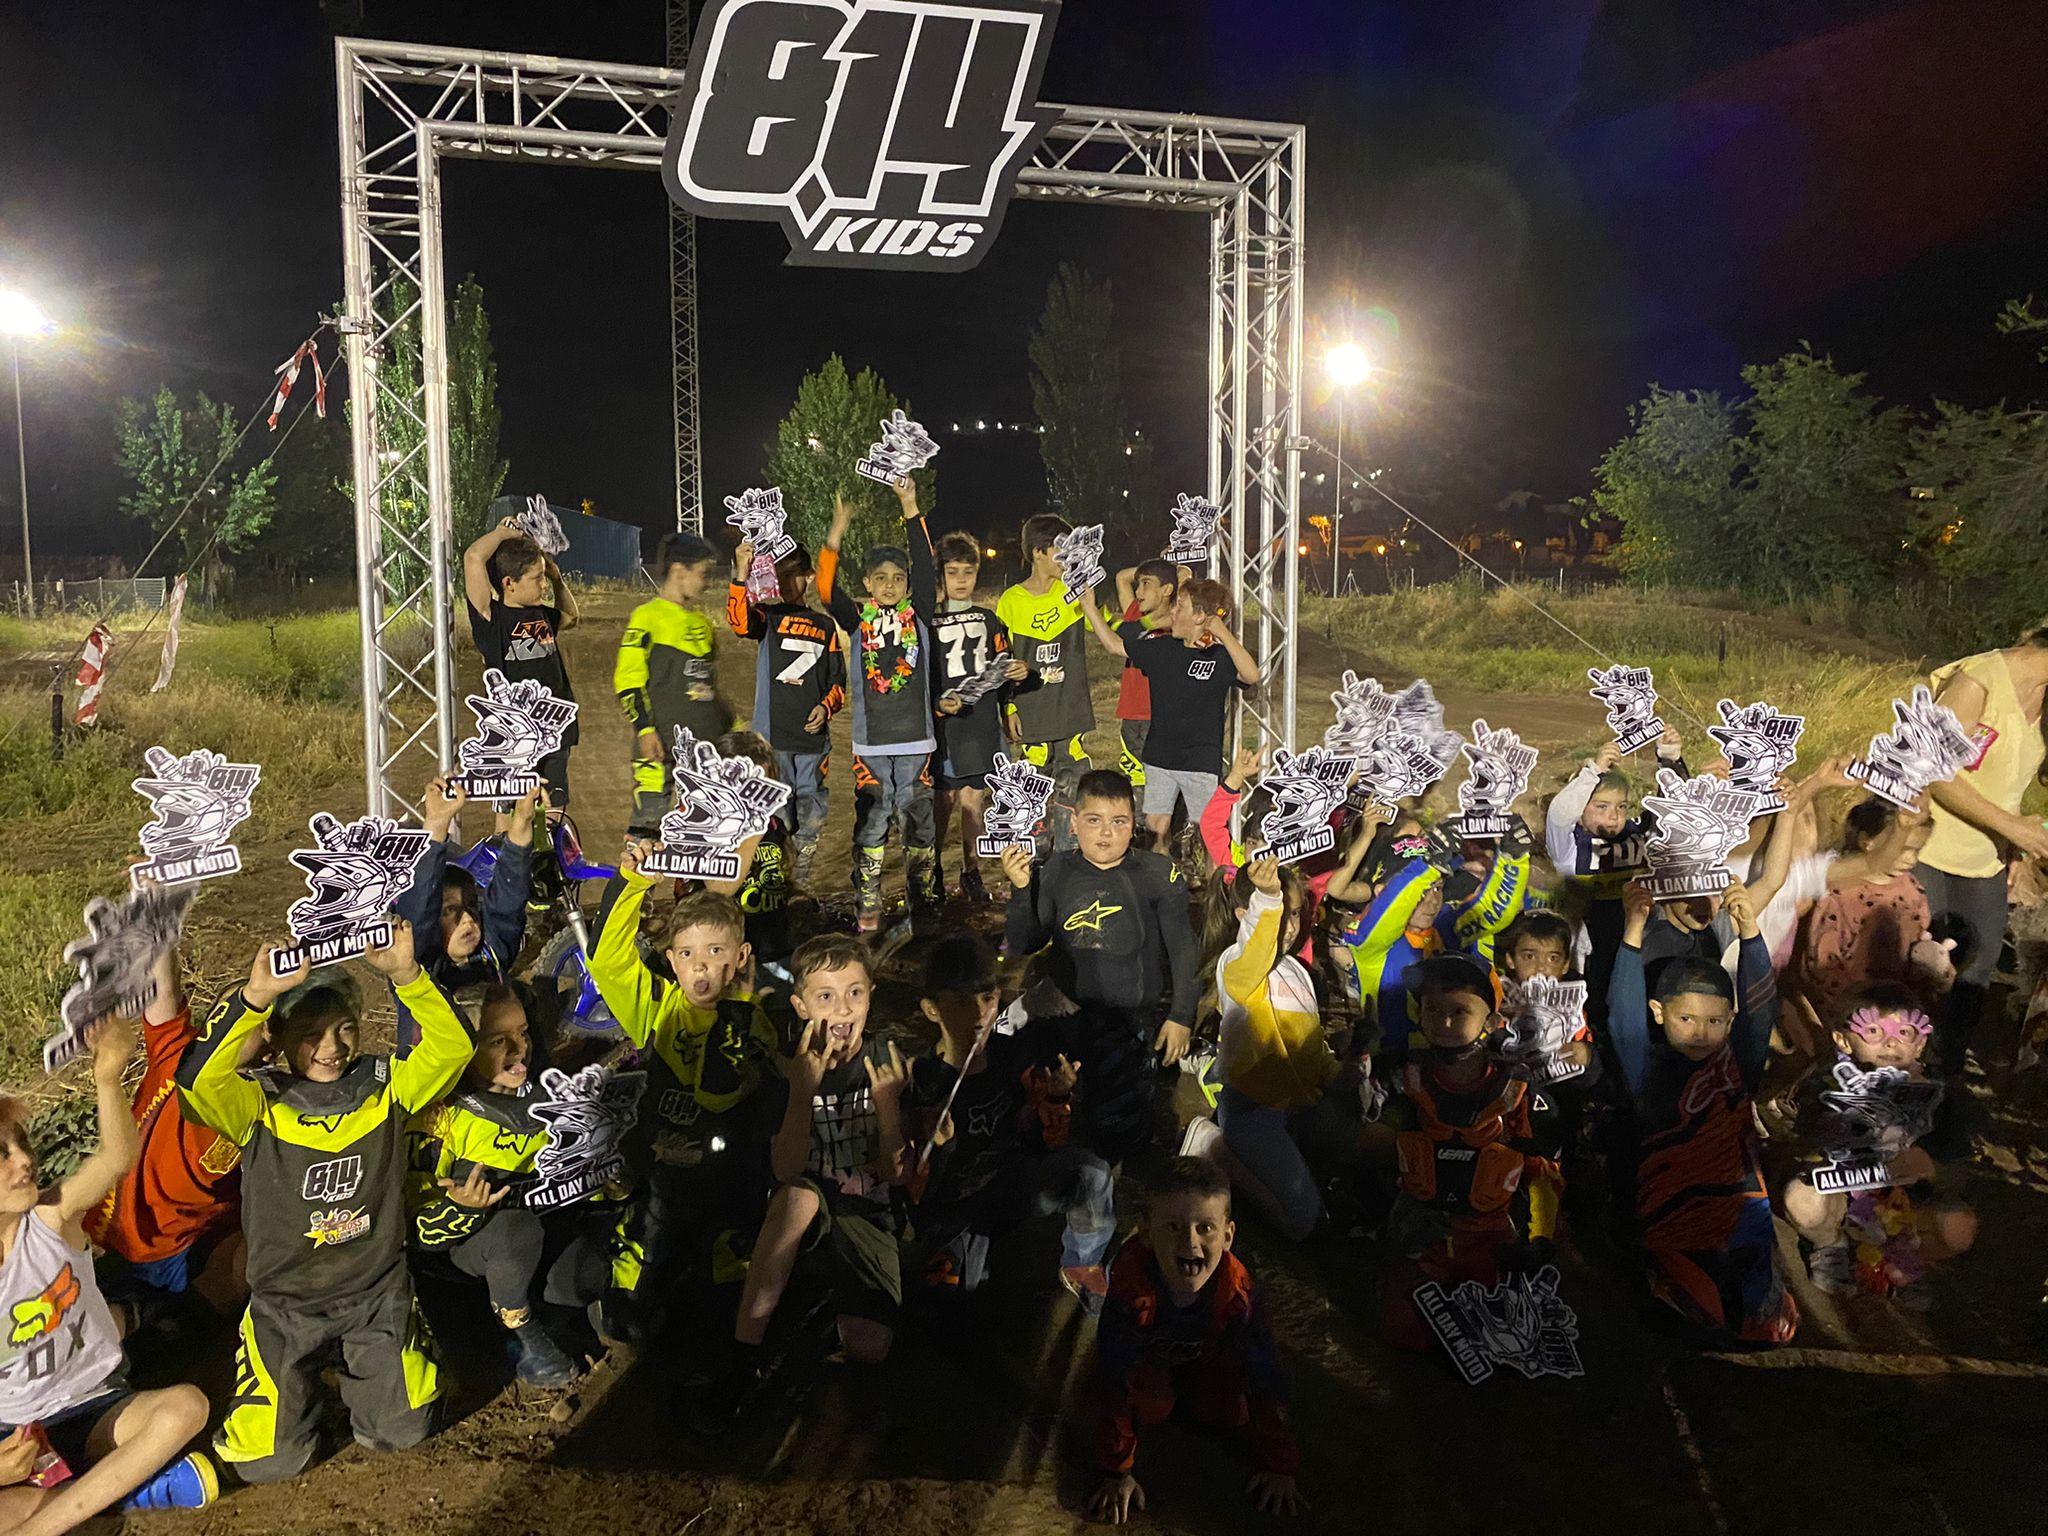 escuela motocross 814 Kids